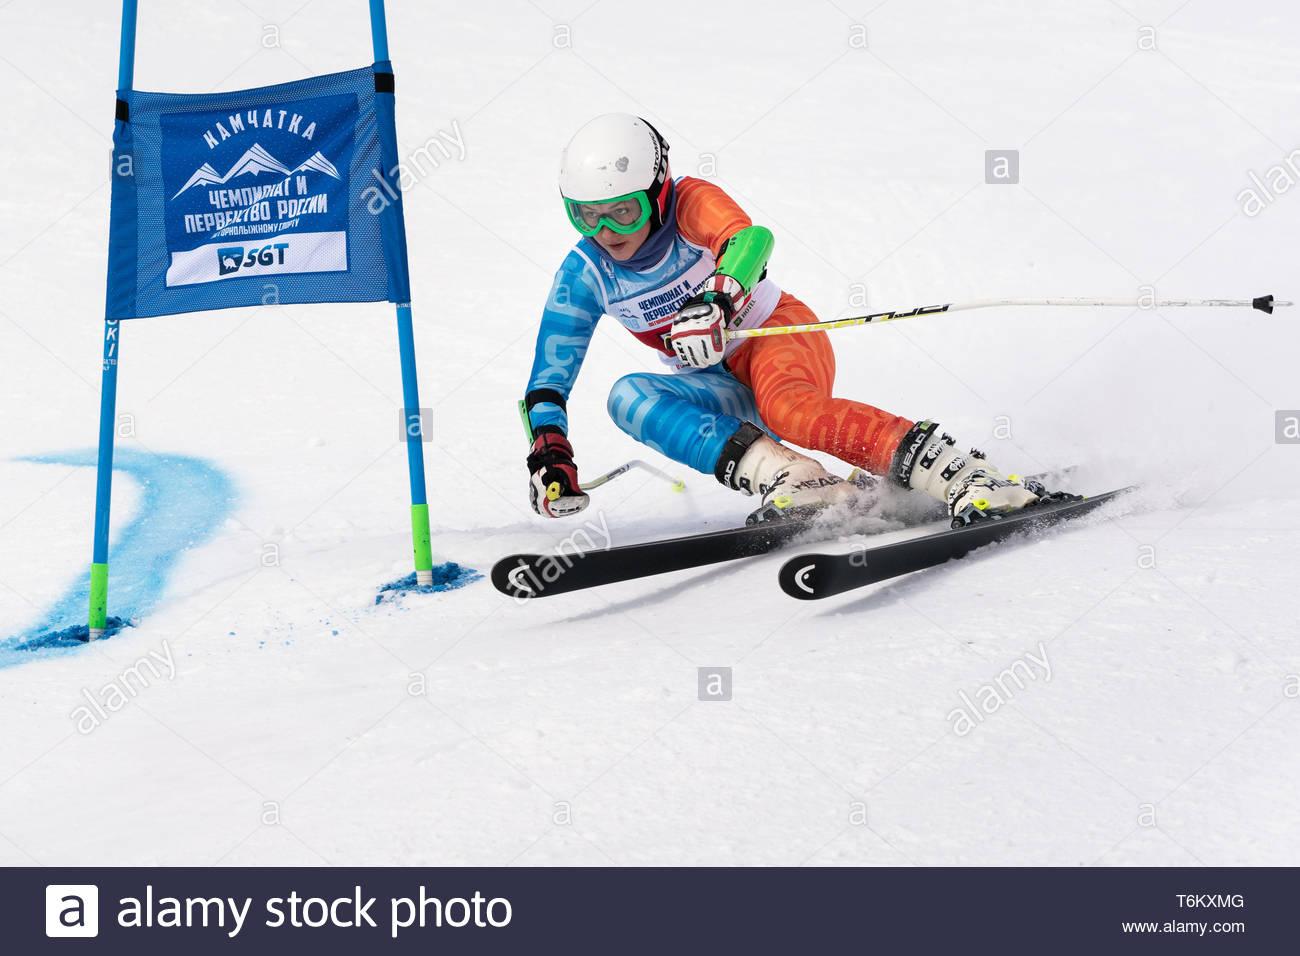 KAMCHATKA PENINSULA, RUSSIA - APR 2, 2019: Mountain skier Fugleva Victoria (Sakhalin) skiing down mount slope. International Ski Federation Championsh - Stock Image